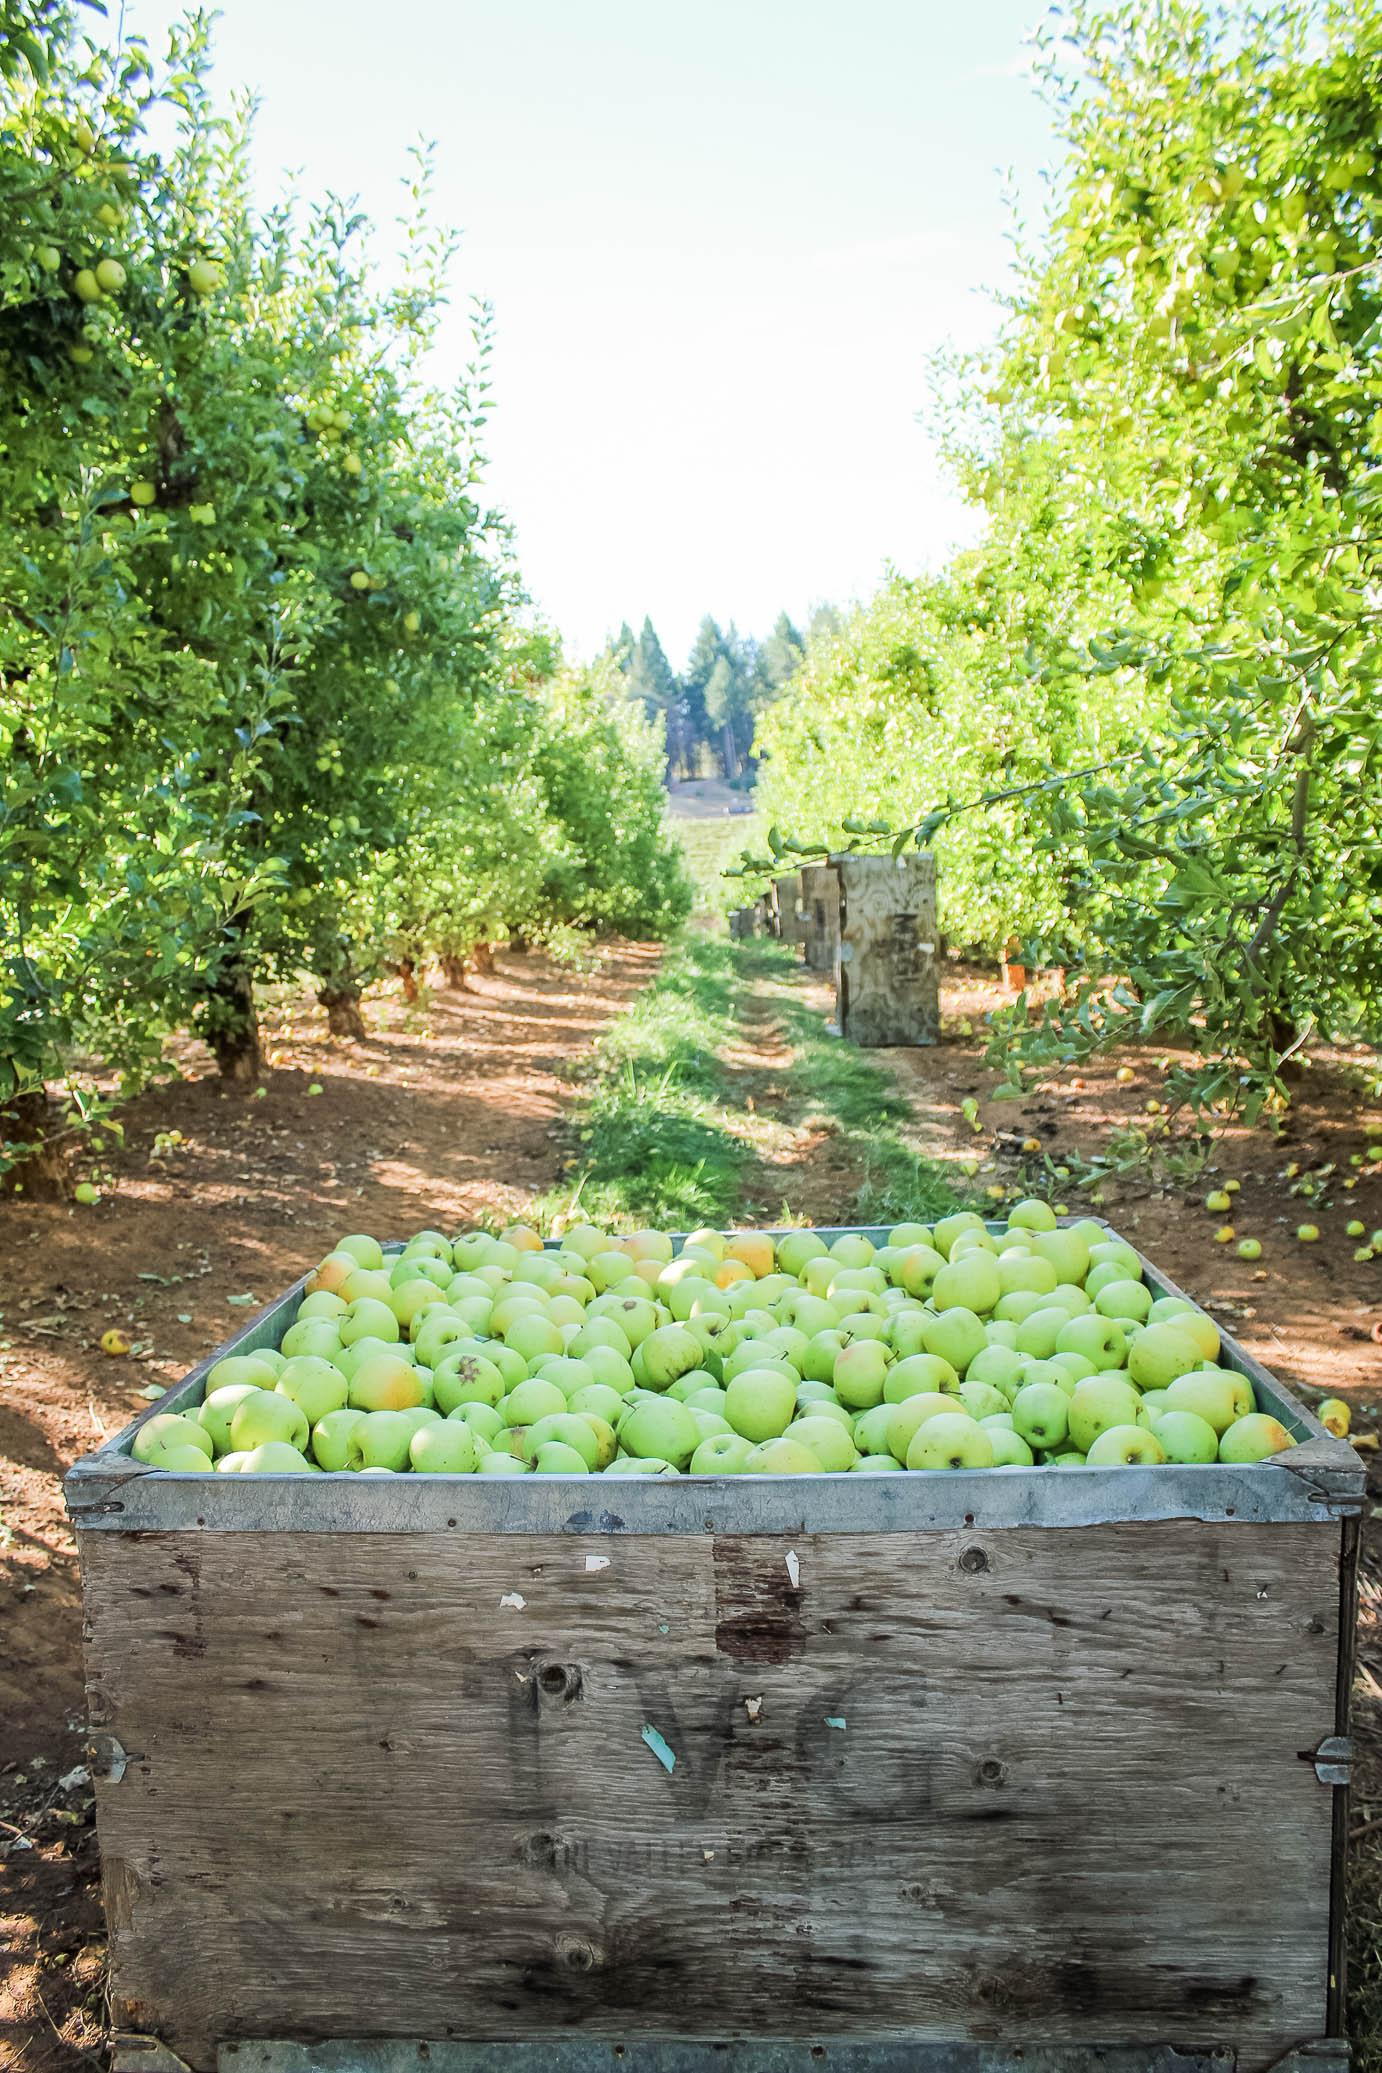 Apples at Kids Inc/Delfino Family Farm in Apple Hill, CA